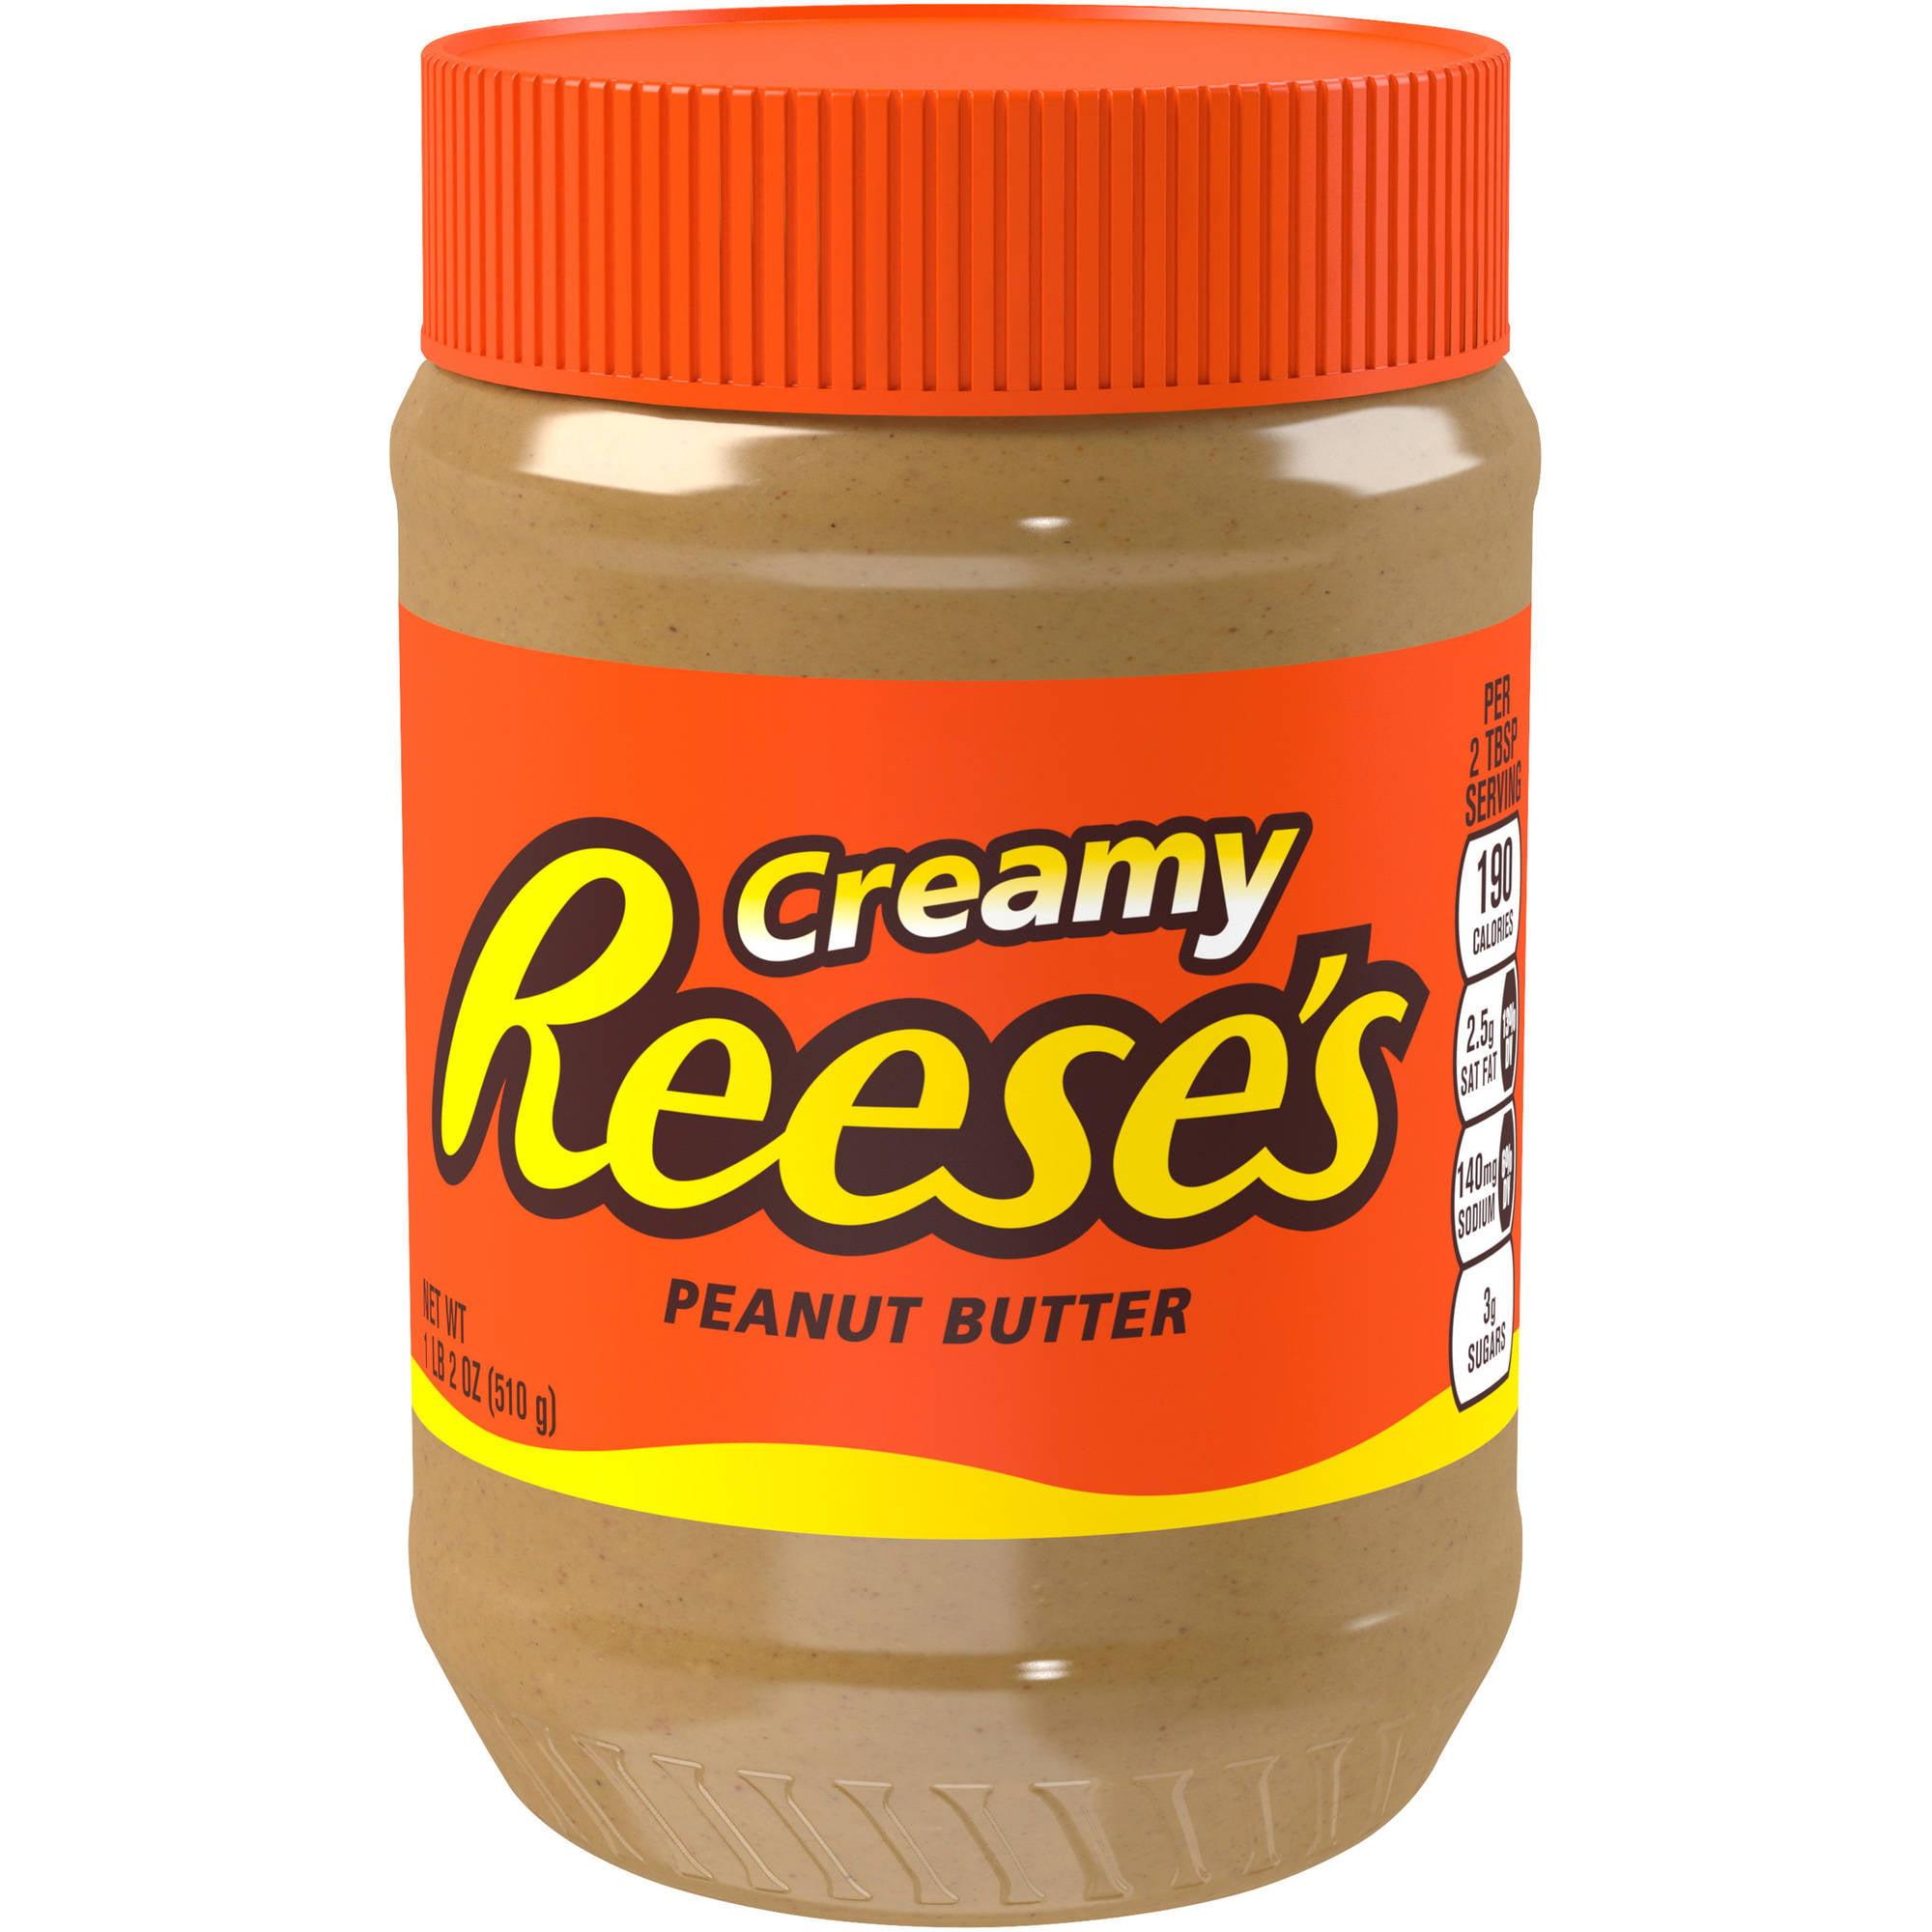 Reese's Creamy Peanut Butter, 18 oz